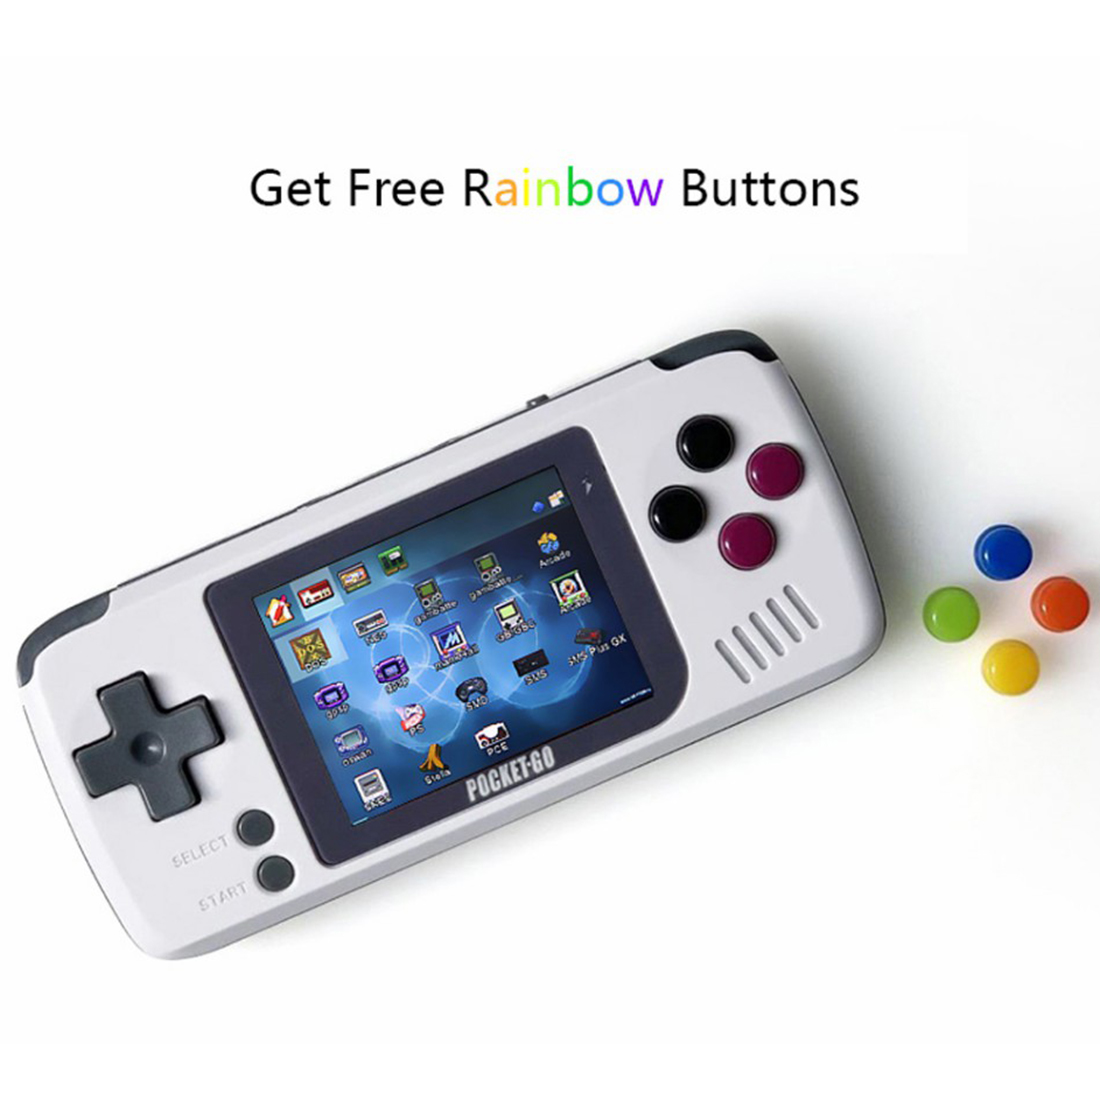 PocketGo Retro Handheld Open Source Game Console (32G)